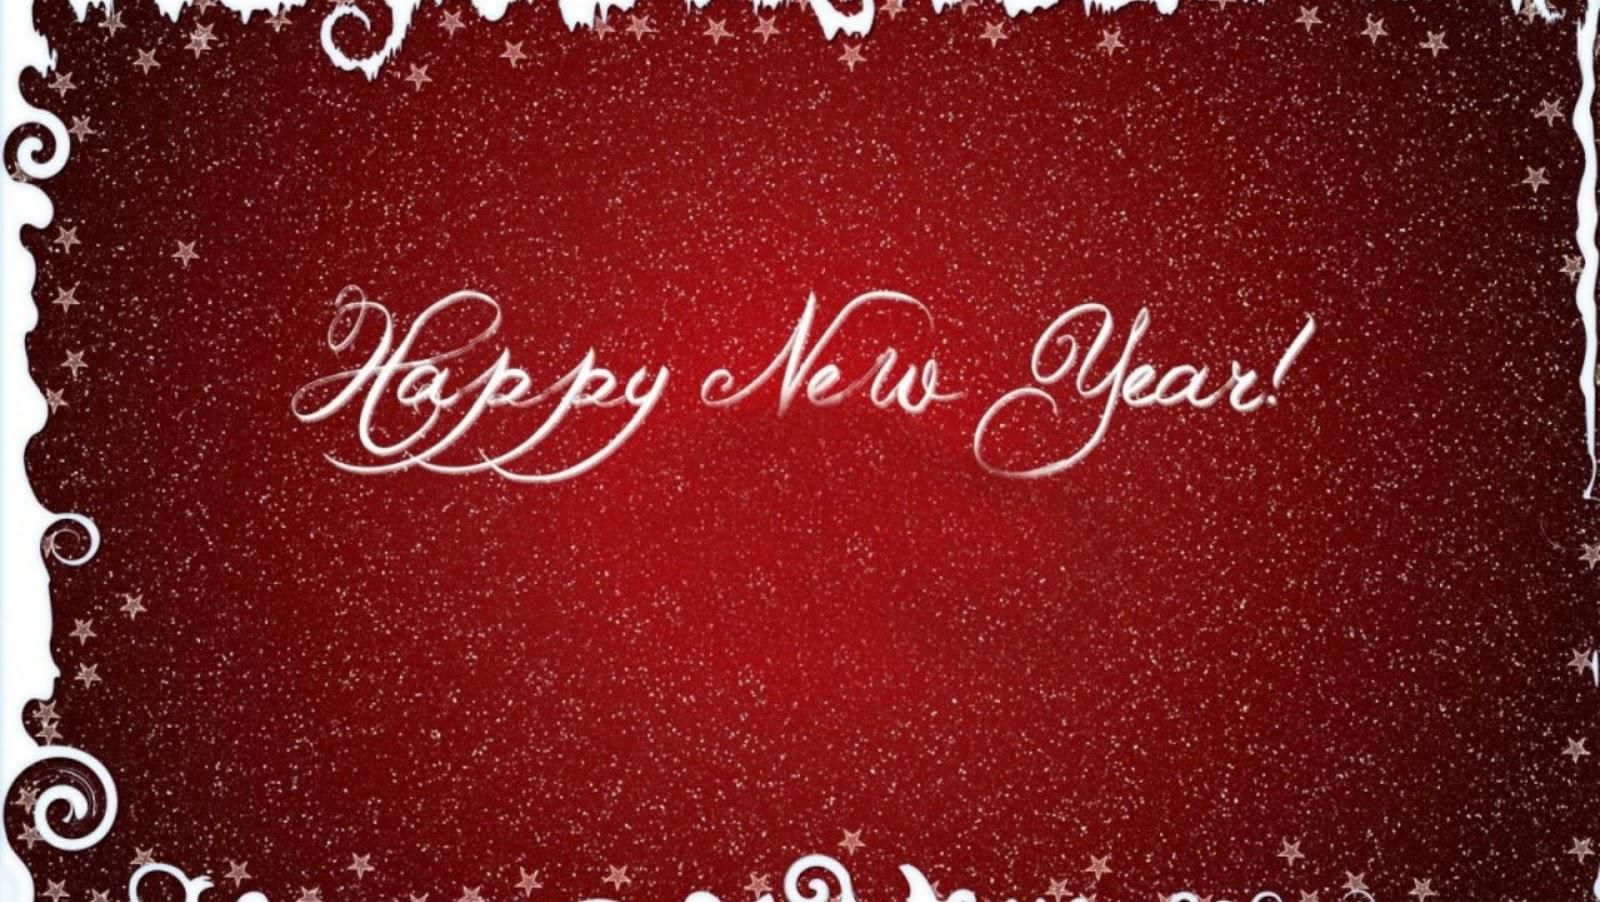 Happy New Year Wishes Photos Superepus News